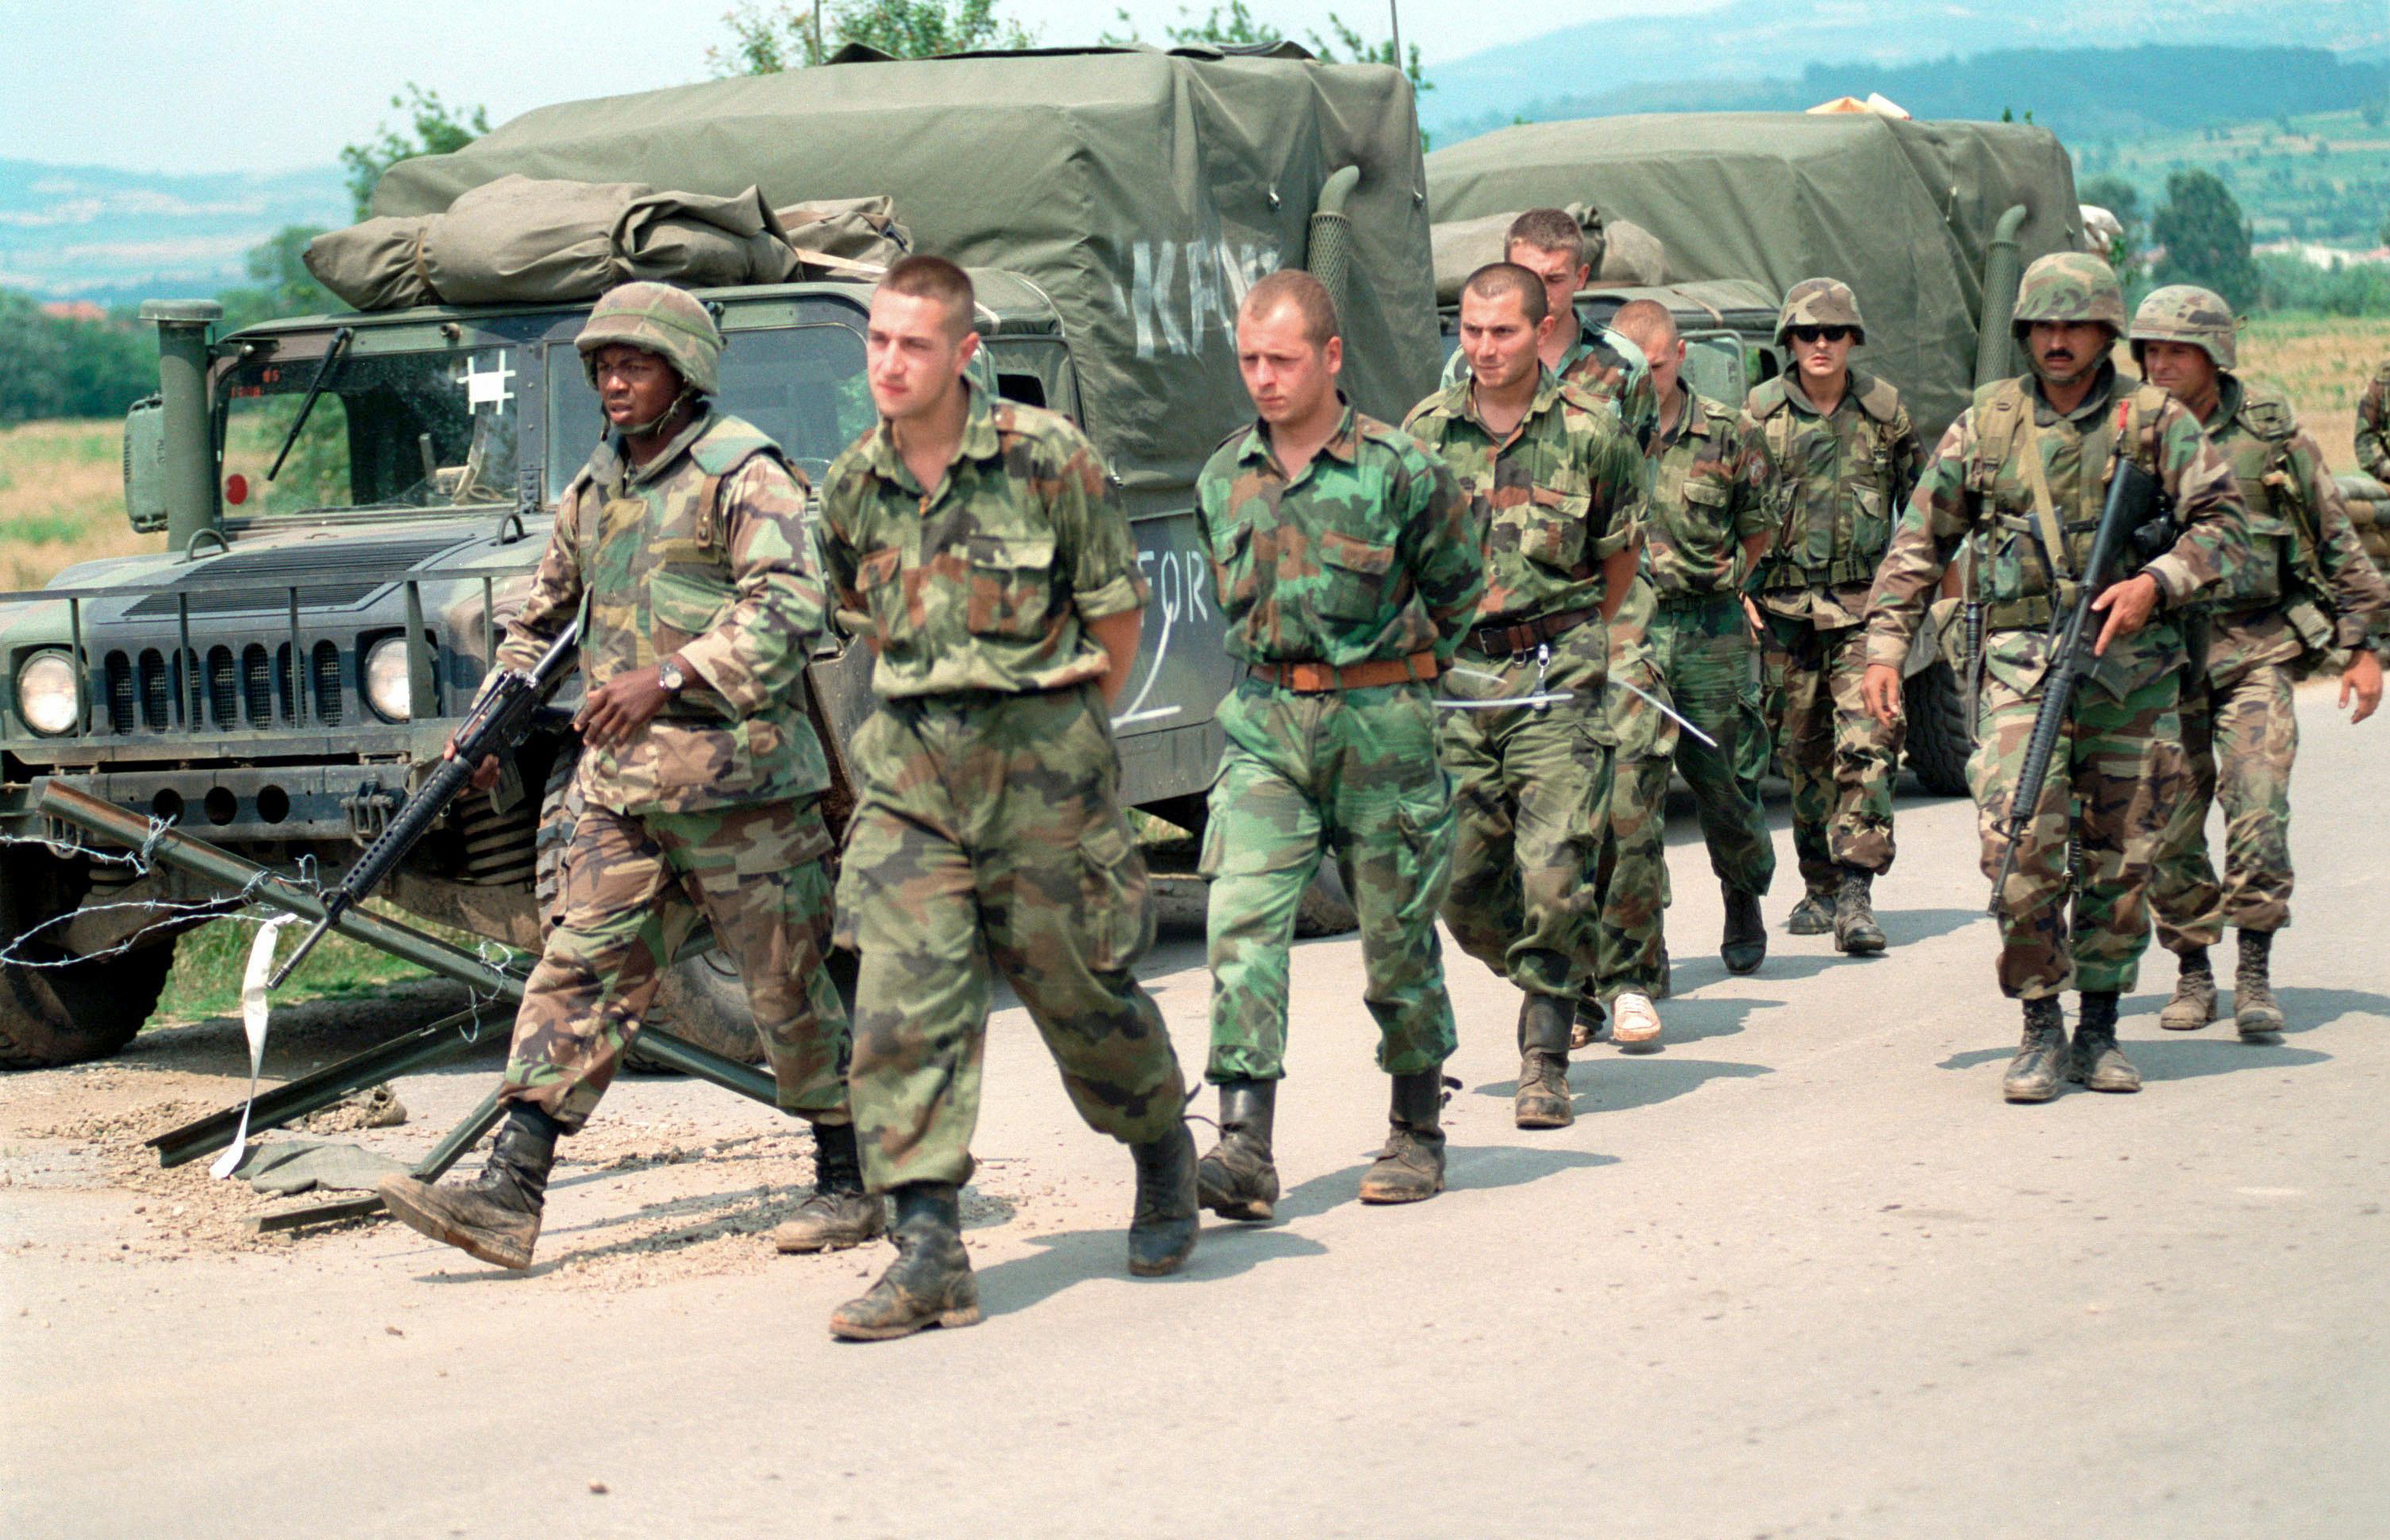 Yogoslavia and escort